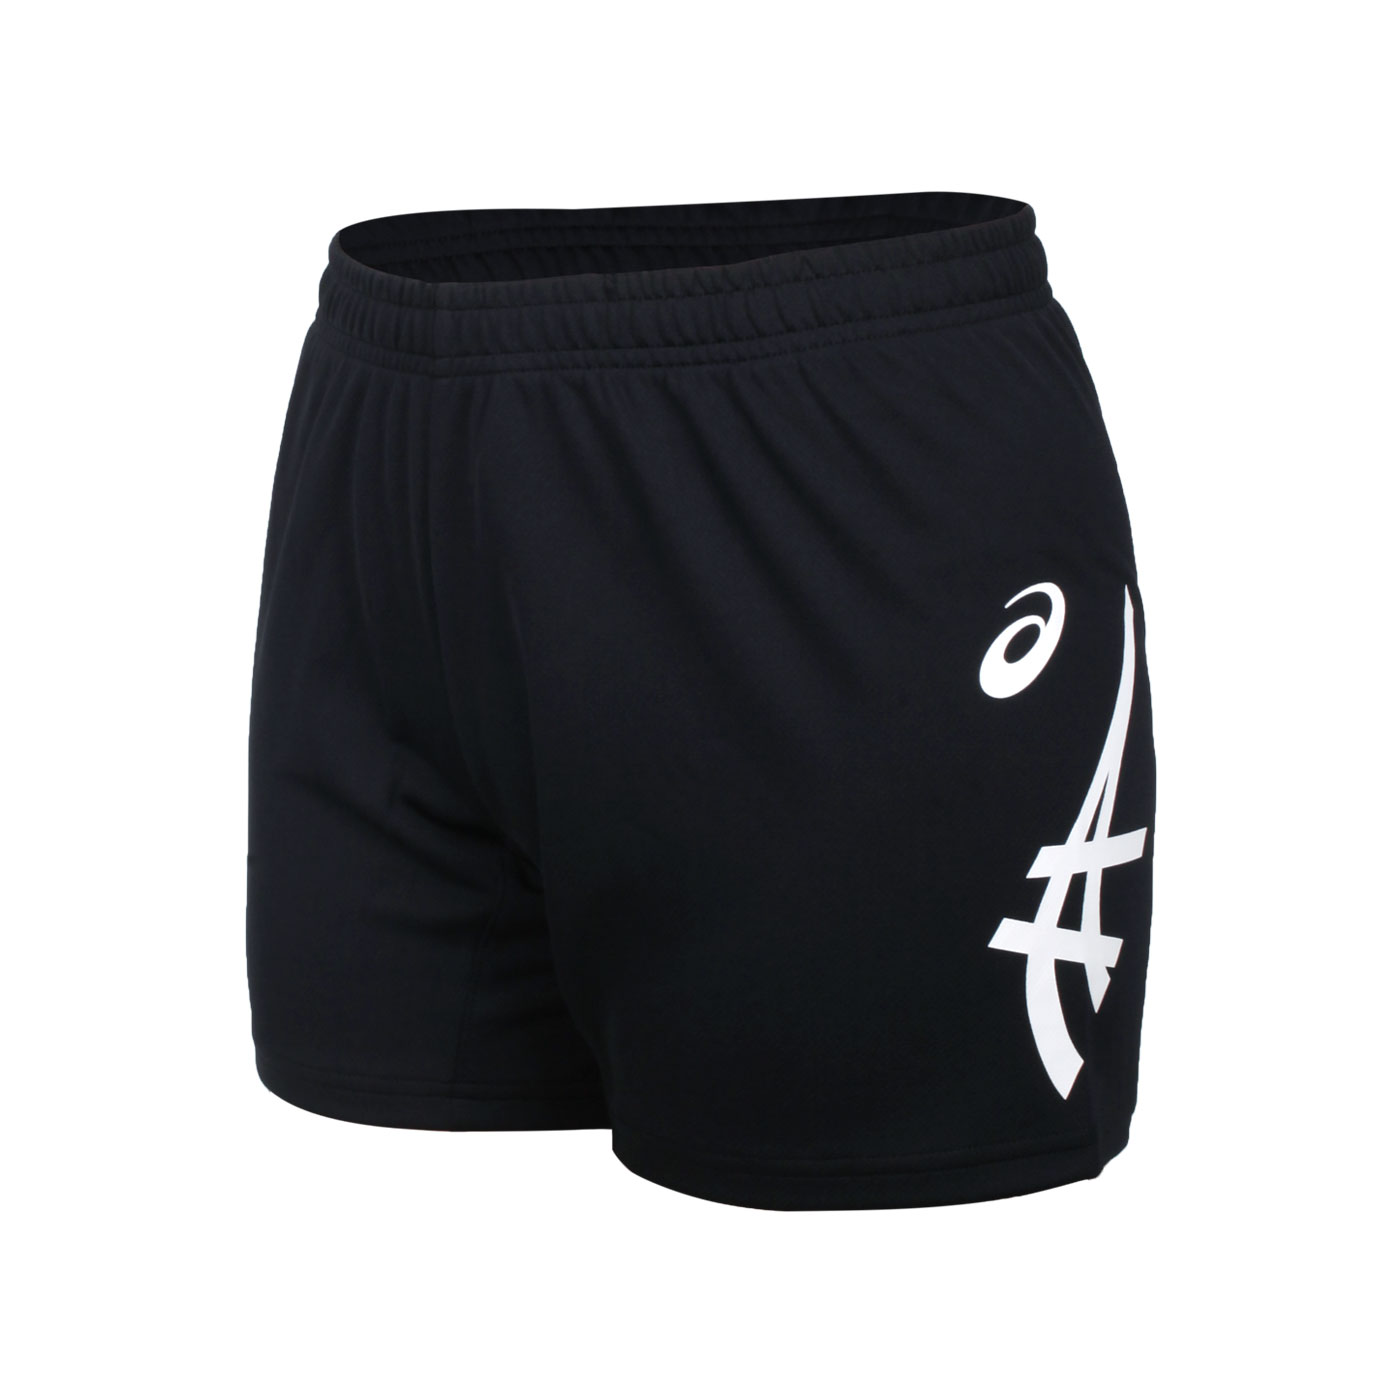 ASICS 女款針織短褲 2052A302-002 - 黑白